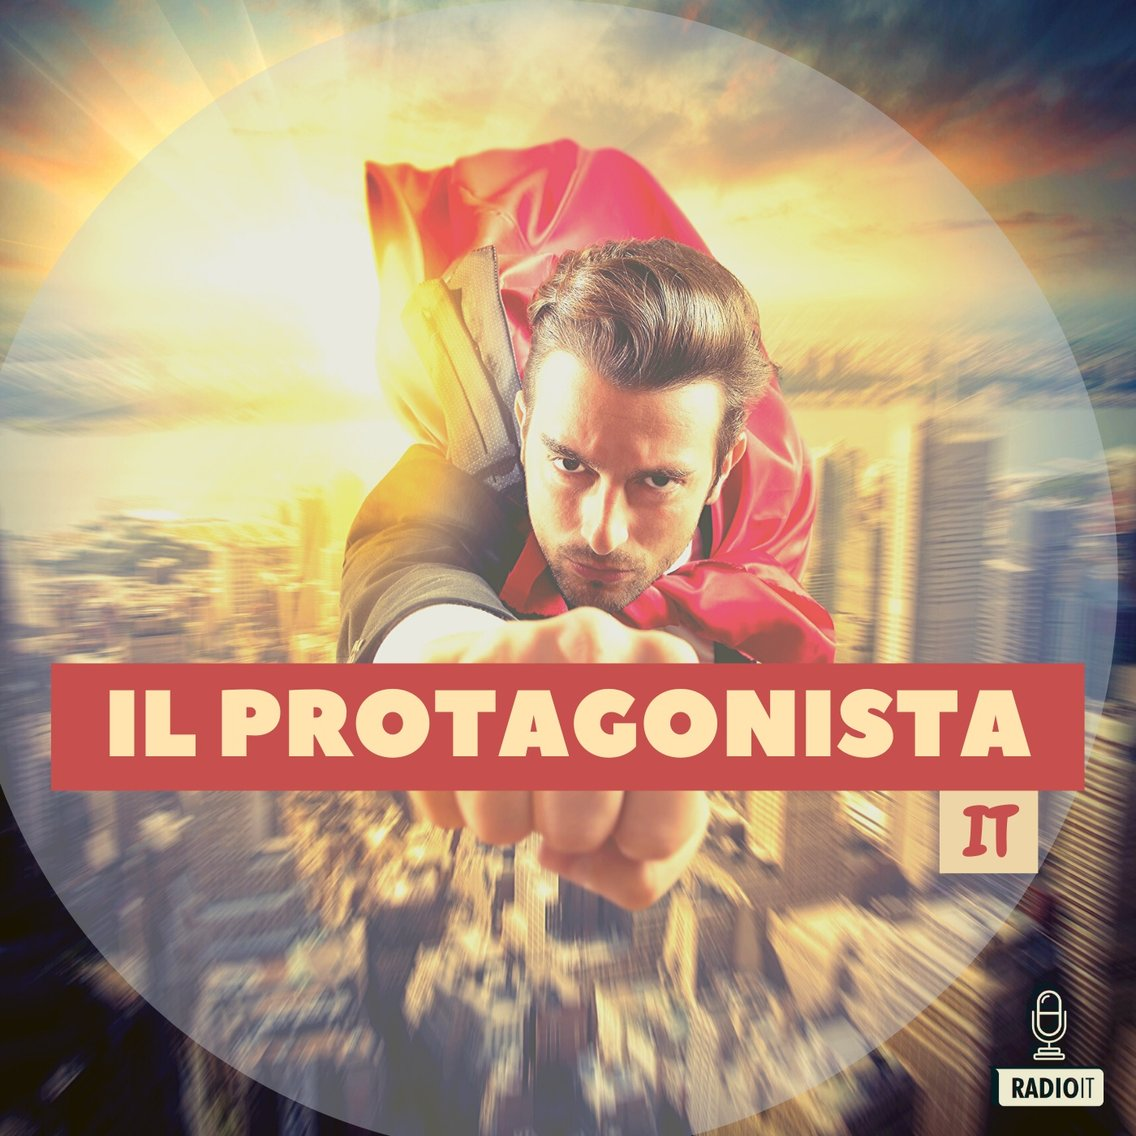 Il Protagonista IT - Cover Image